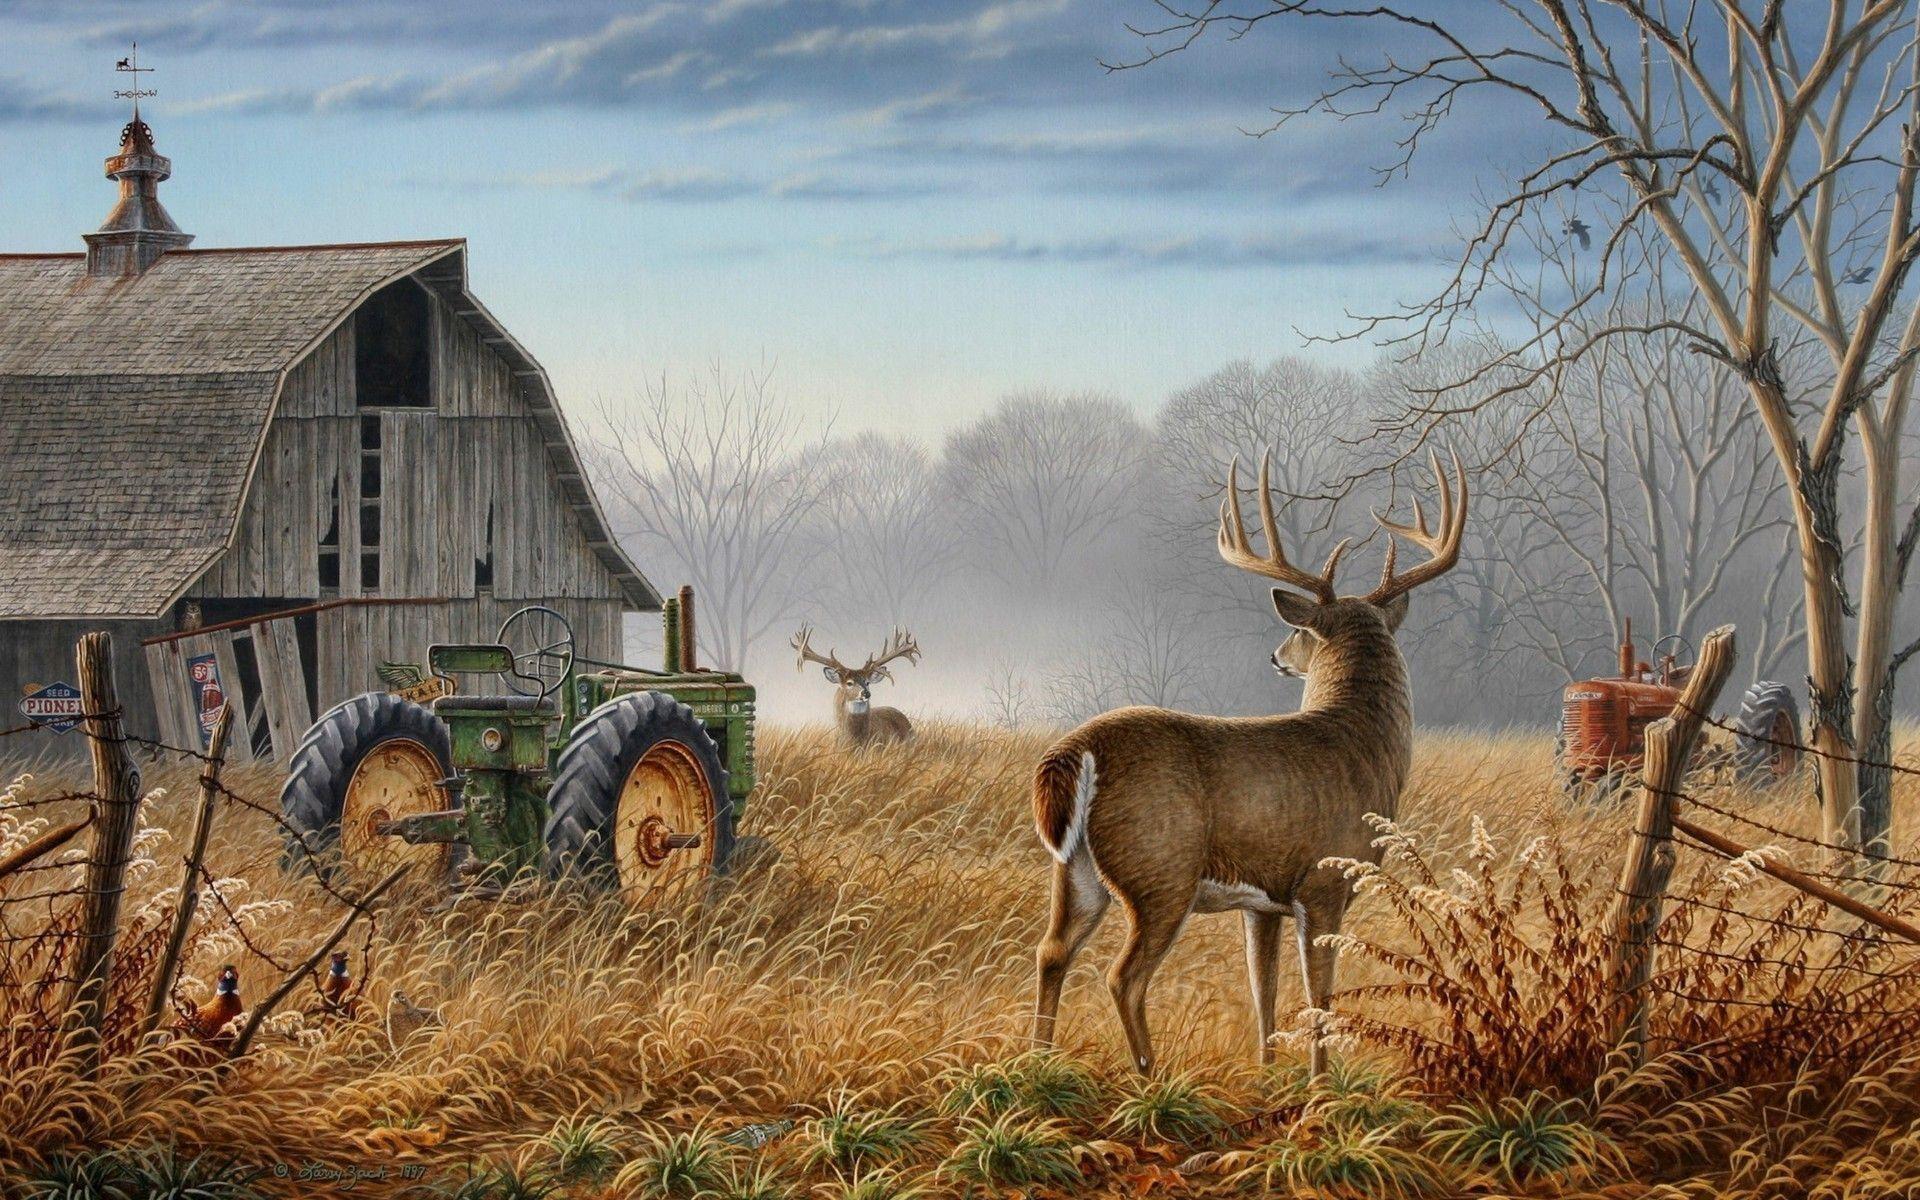 Deer Hunting Wallpaper For Computer | Large HD Wallpaper Database